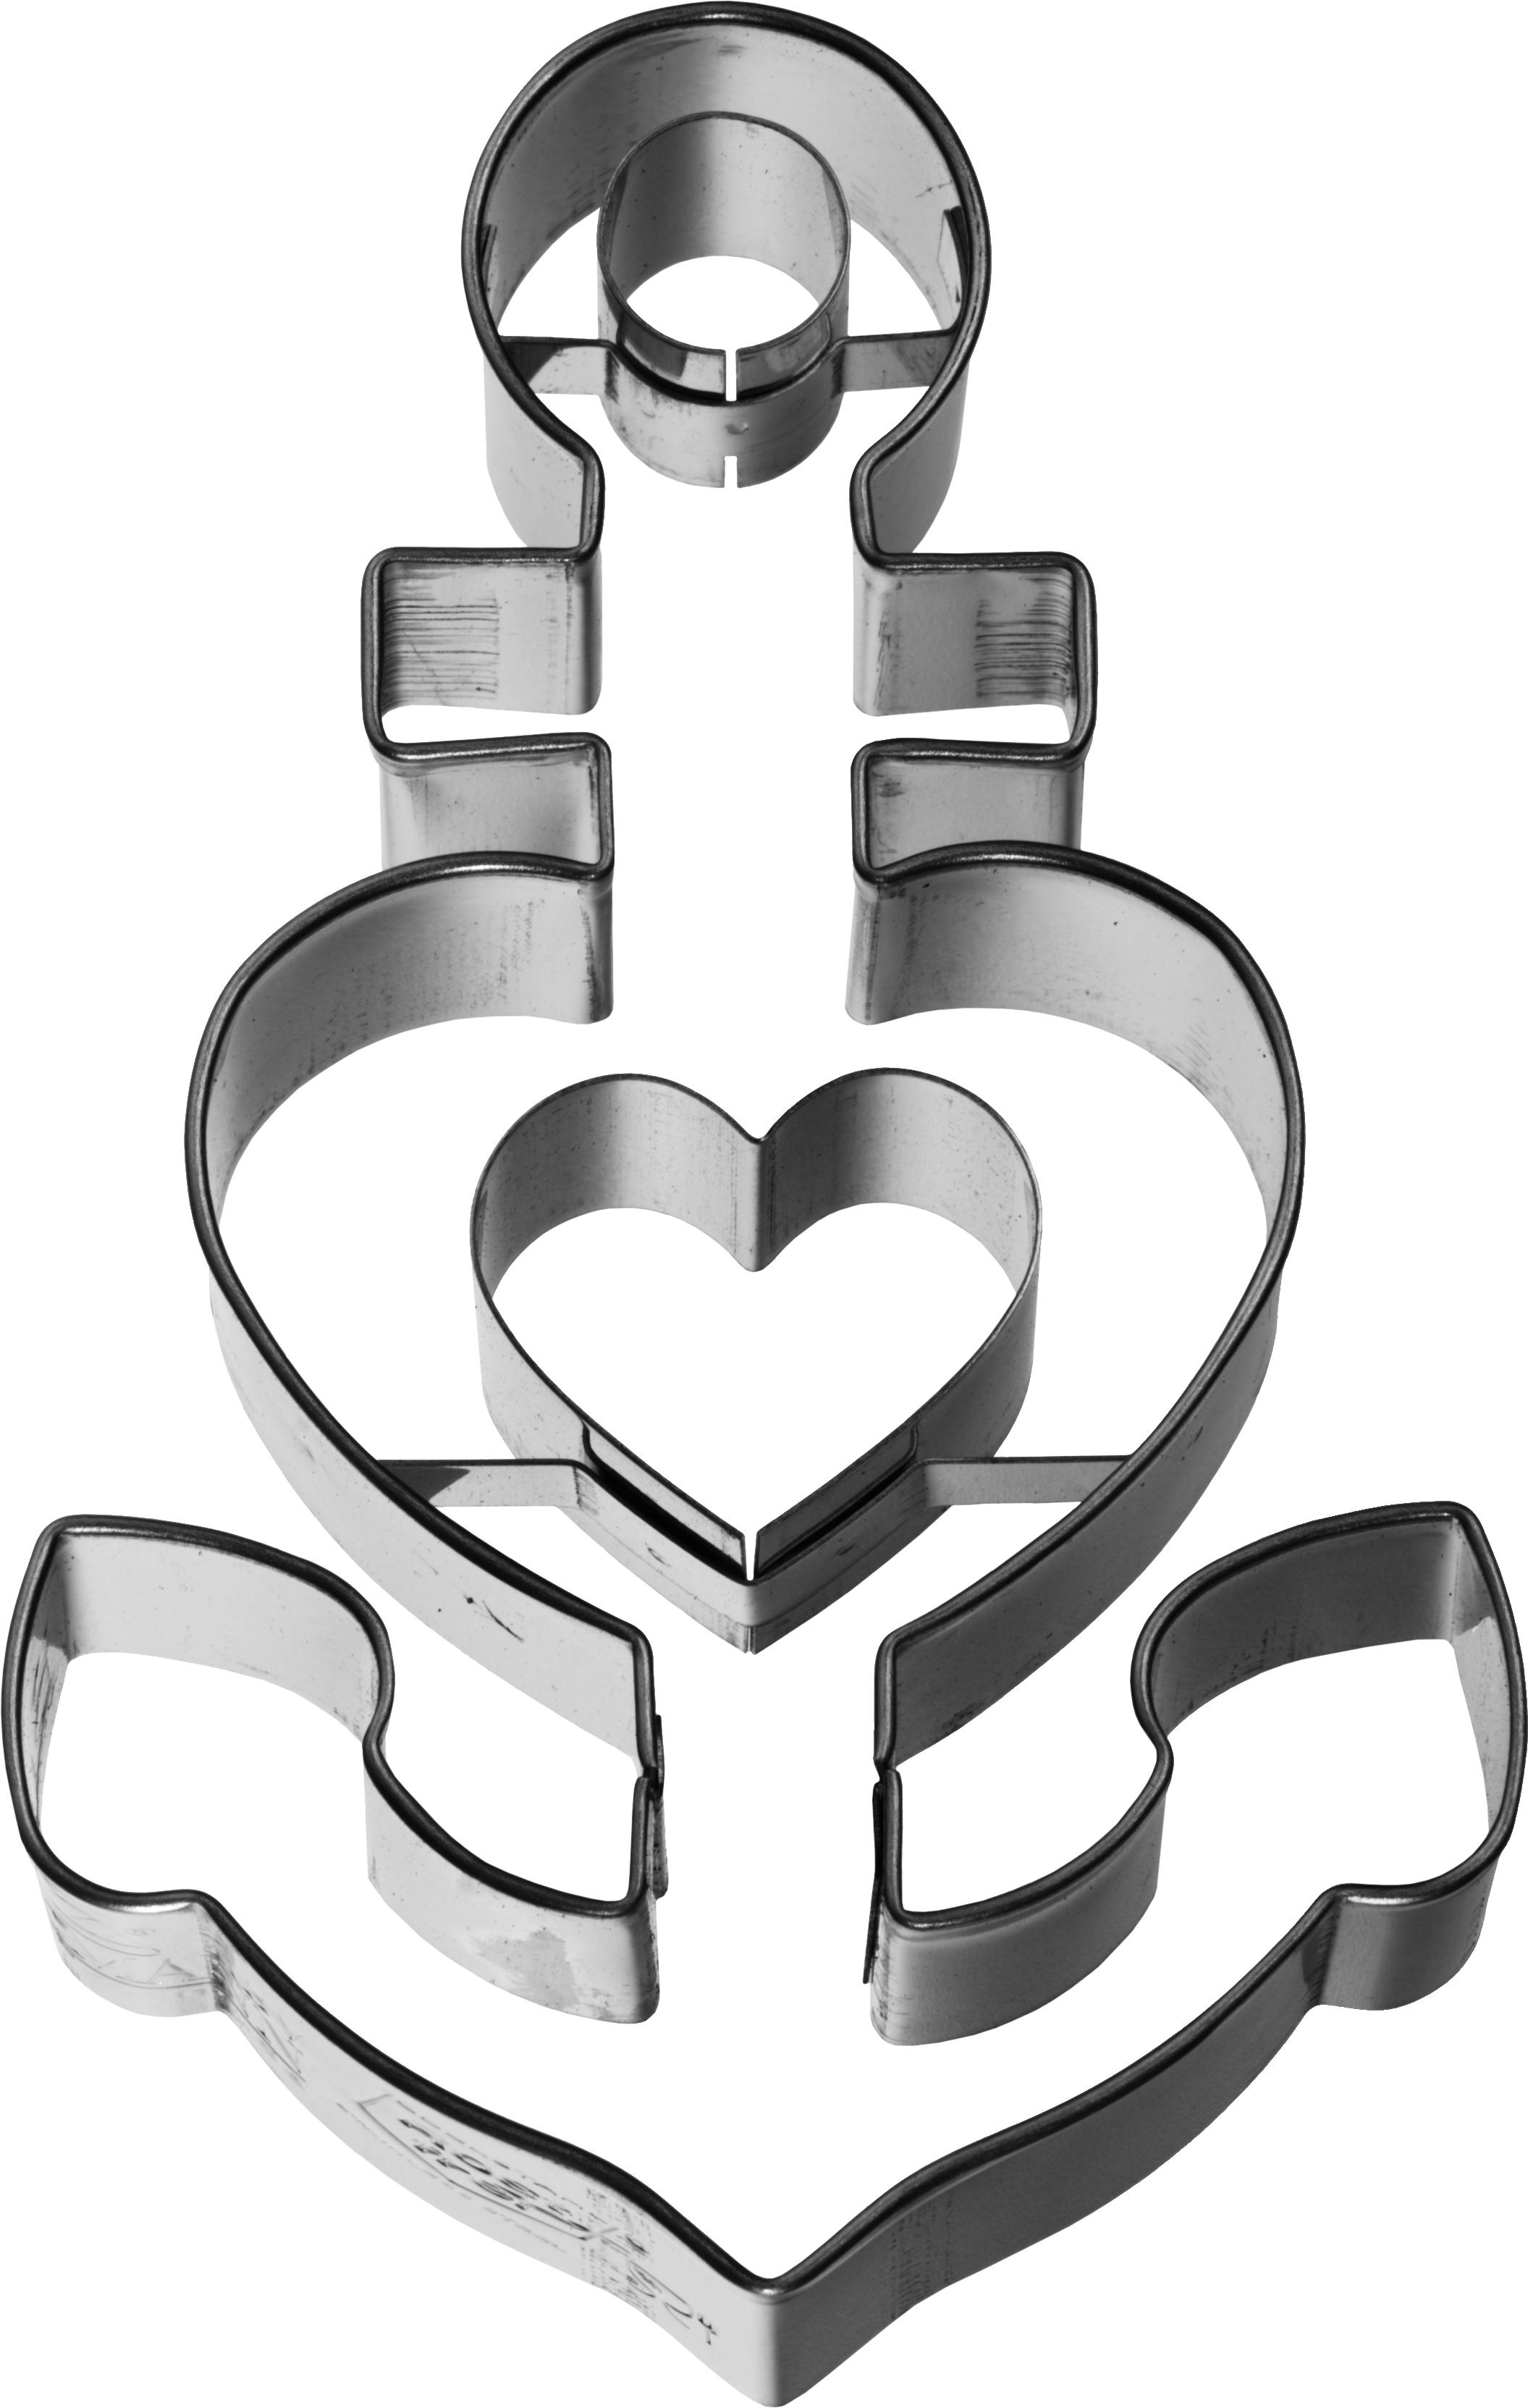 Ausstechform Glaube Liebe Hoffnung